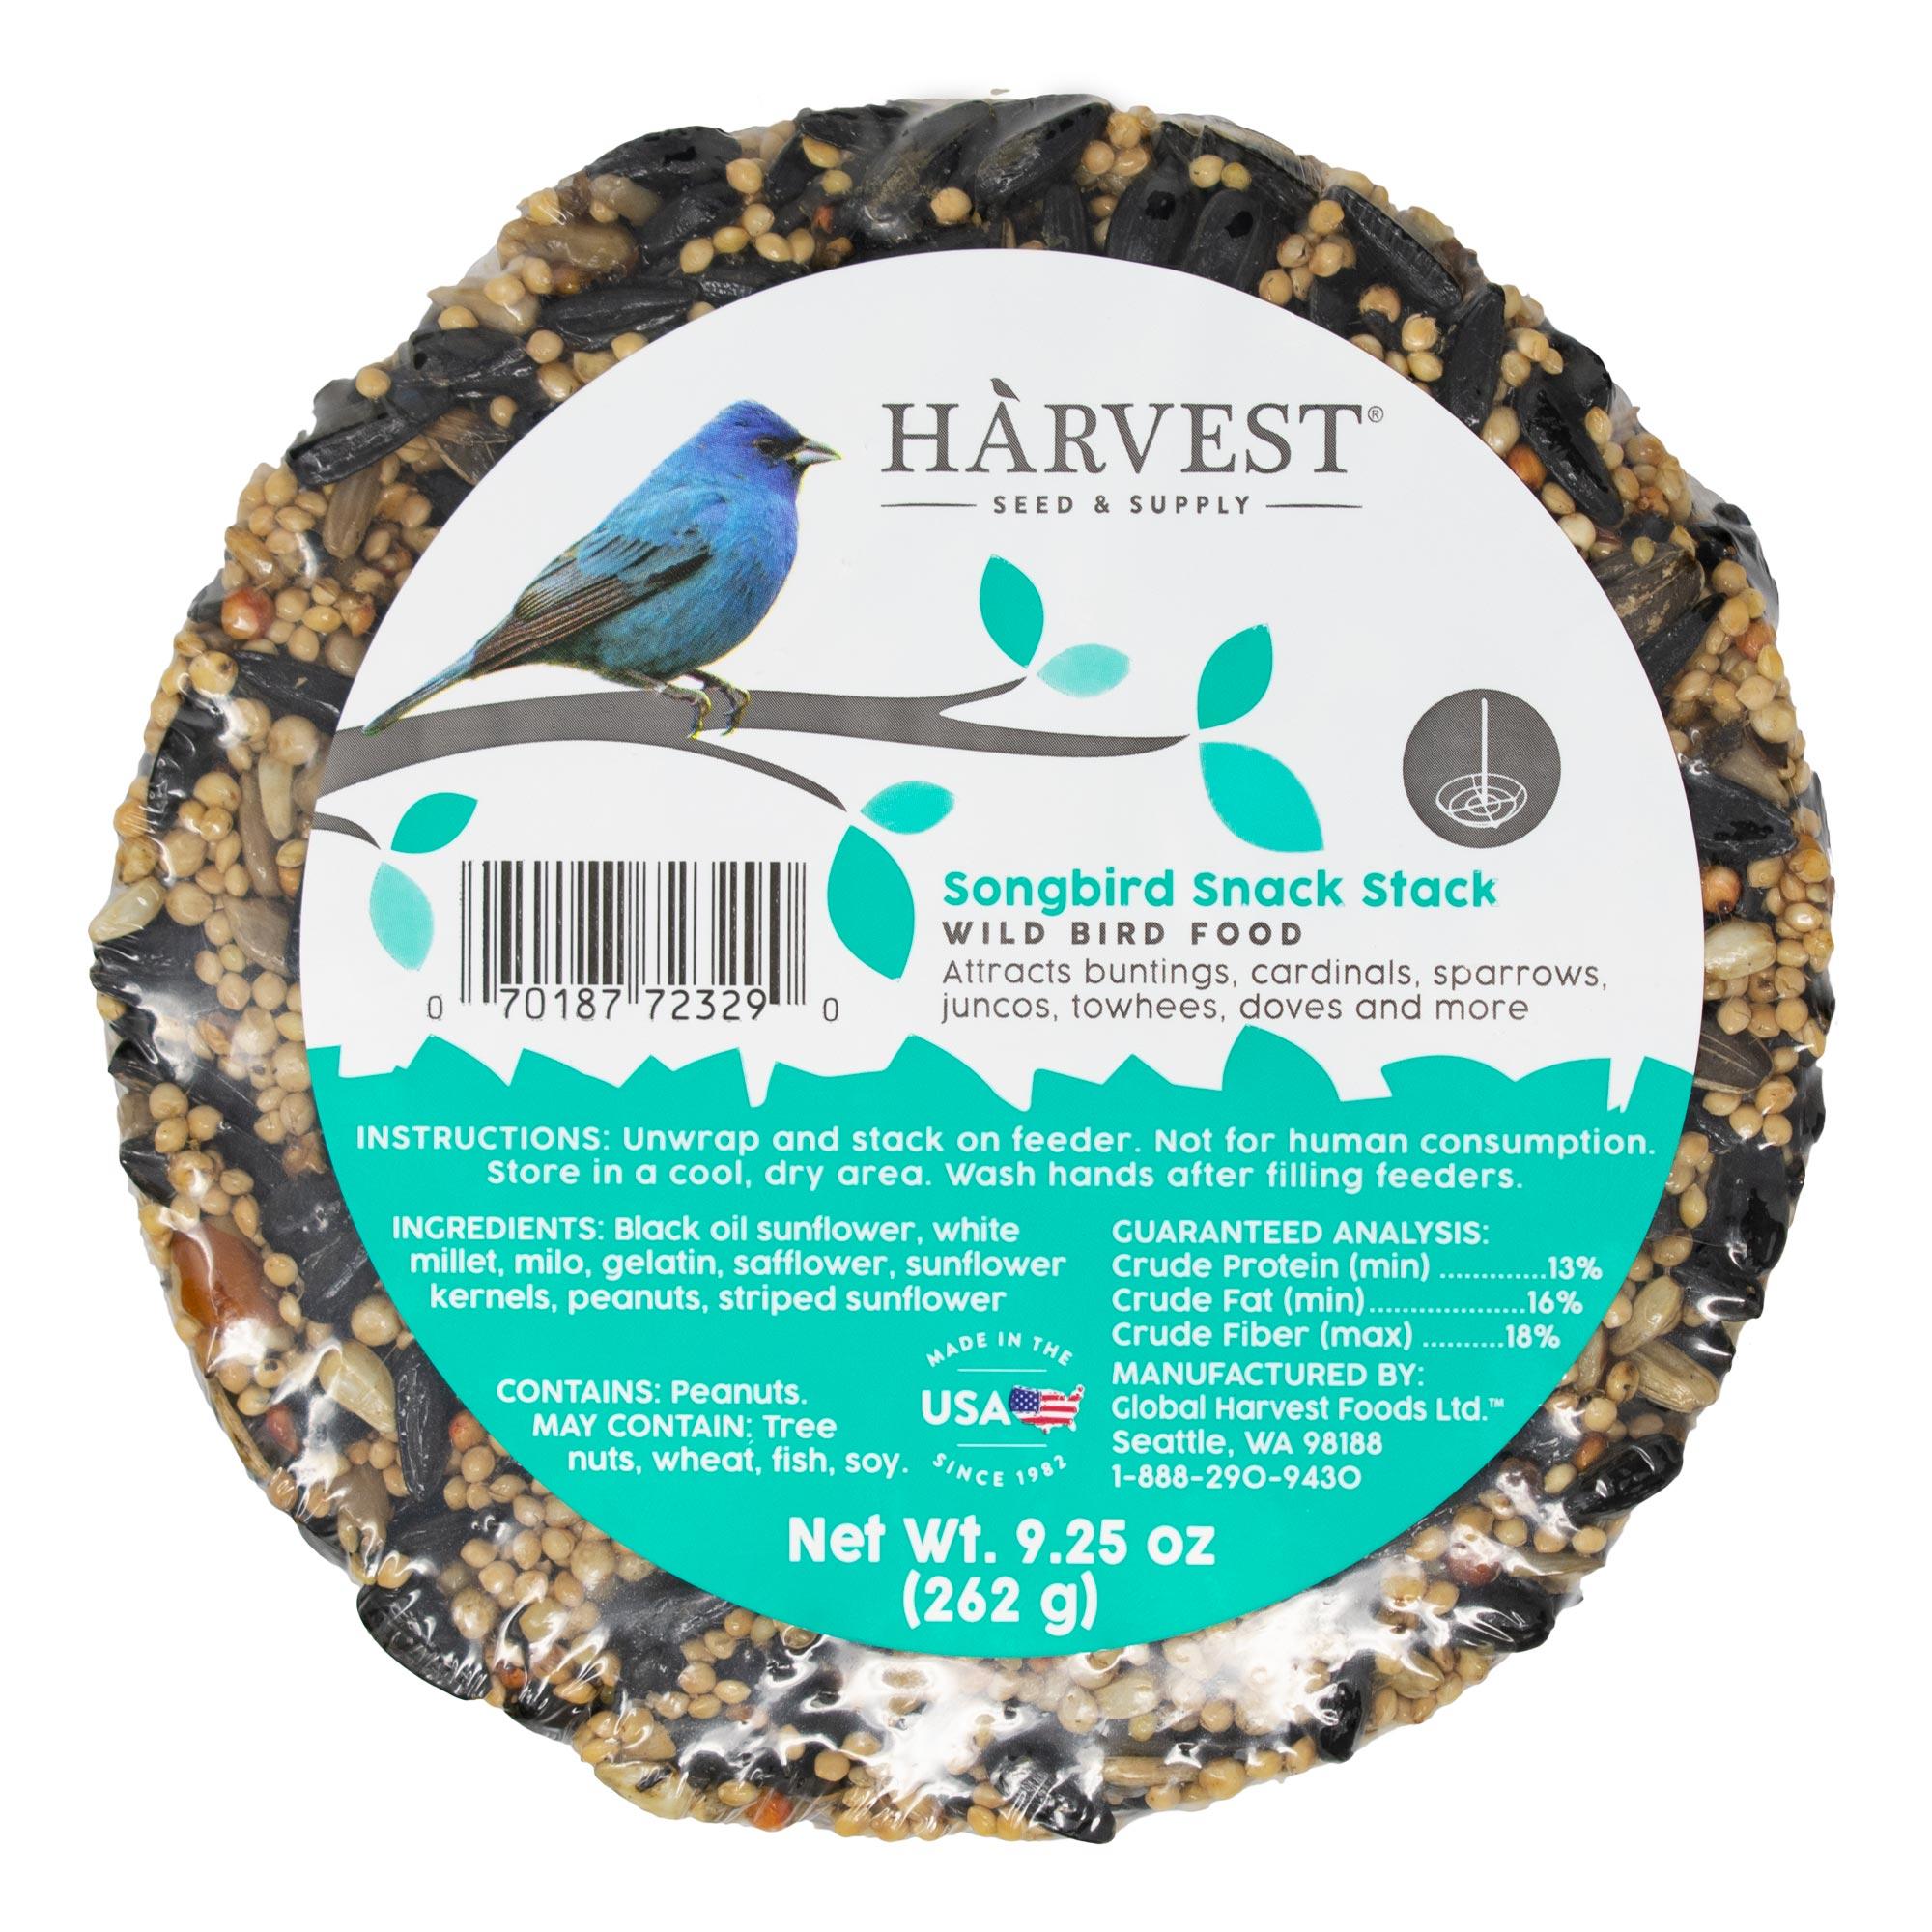 Songbird Snack Stack Image